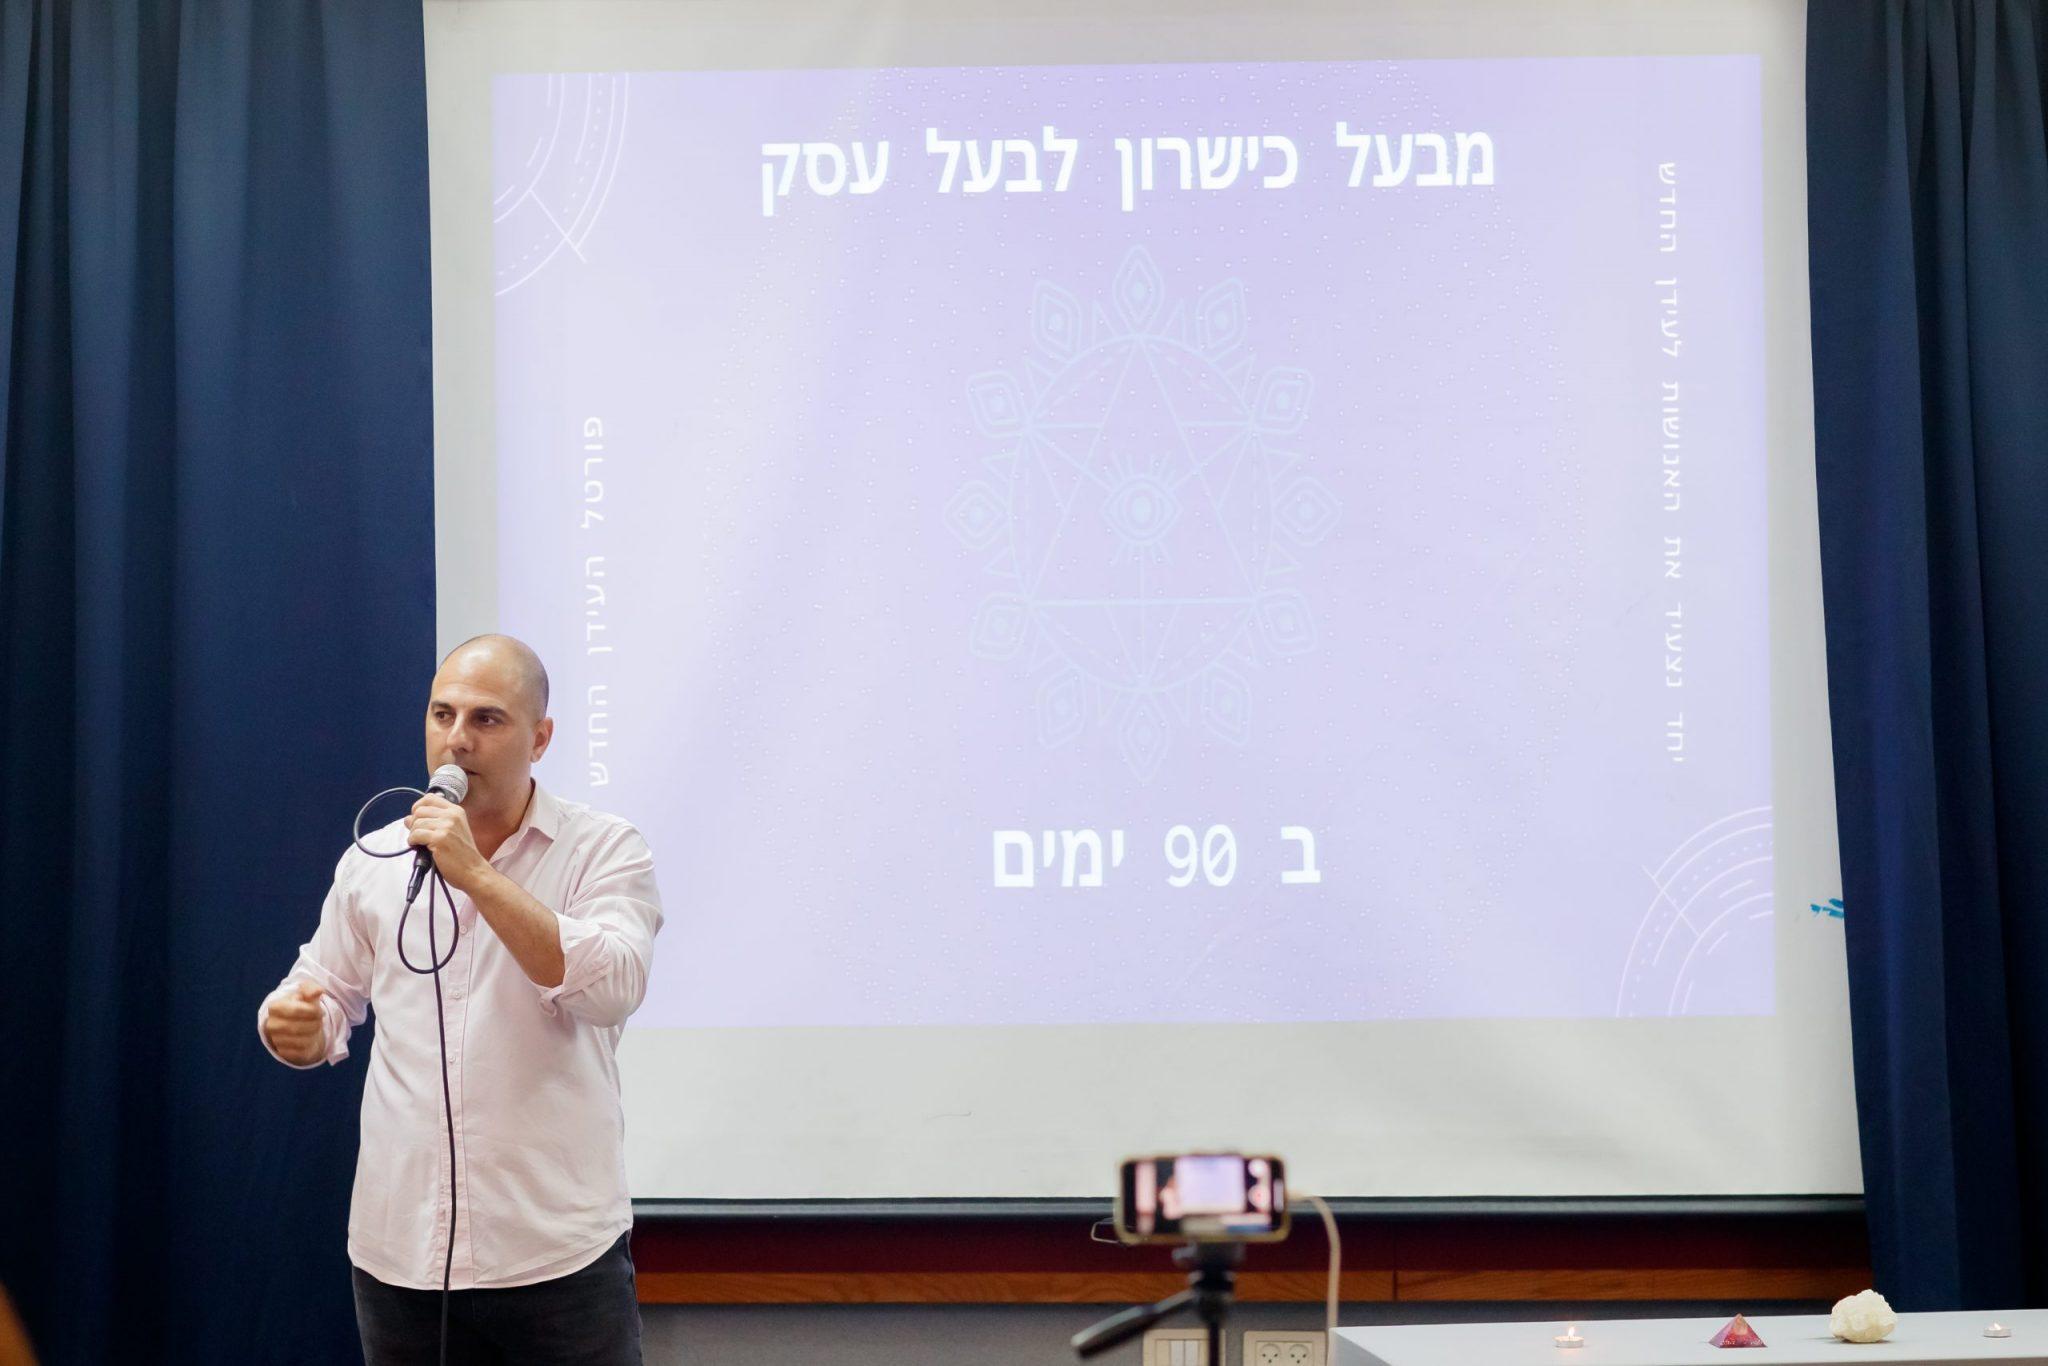 Photographer : Nitzan gur ; www.nitzang.com